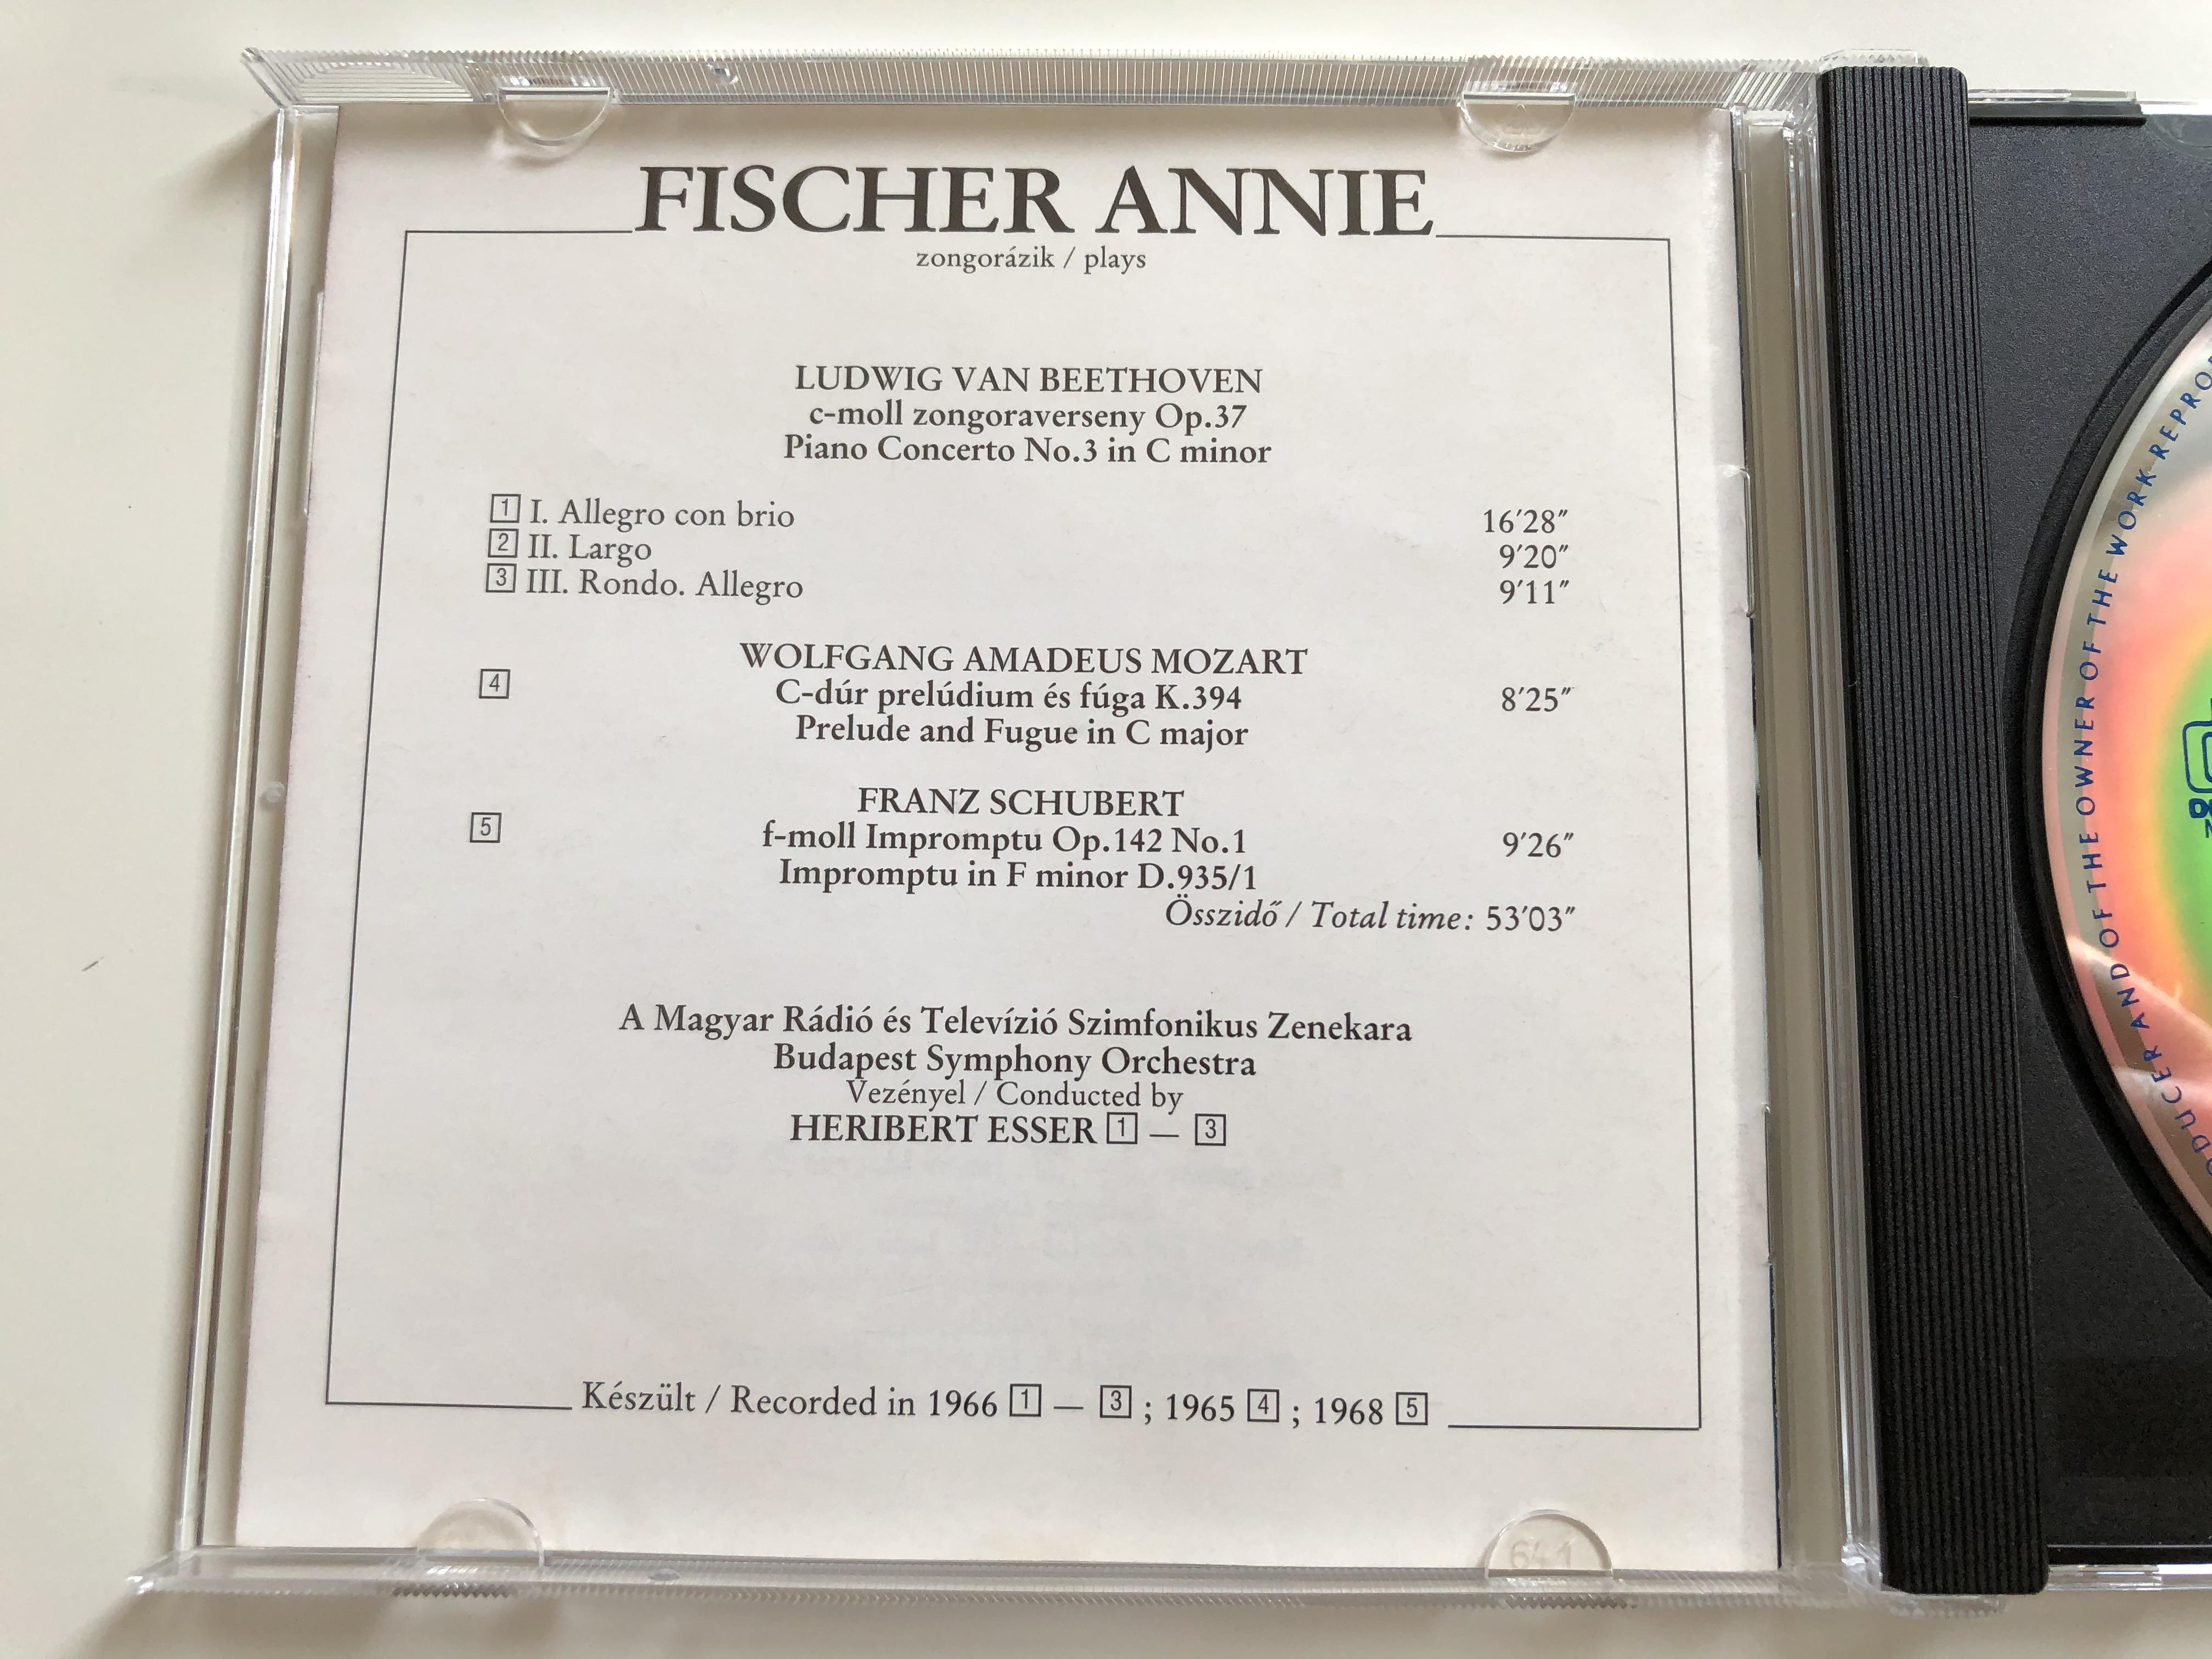 annie-fischer-piano-beethoven-piano-concerto-no.3-mozart-prelude-and-fugue-k.394-schubert-impromptu-in-f-minor-d.9351-budapest-symphony-orchestra-heribert-esser-hungaroton-classic-4-.jpg